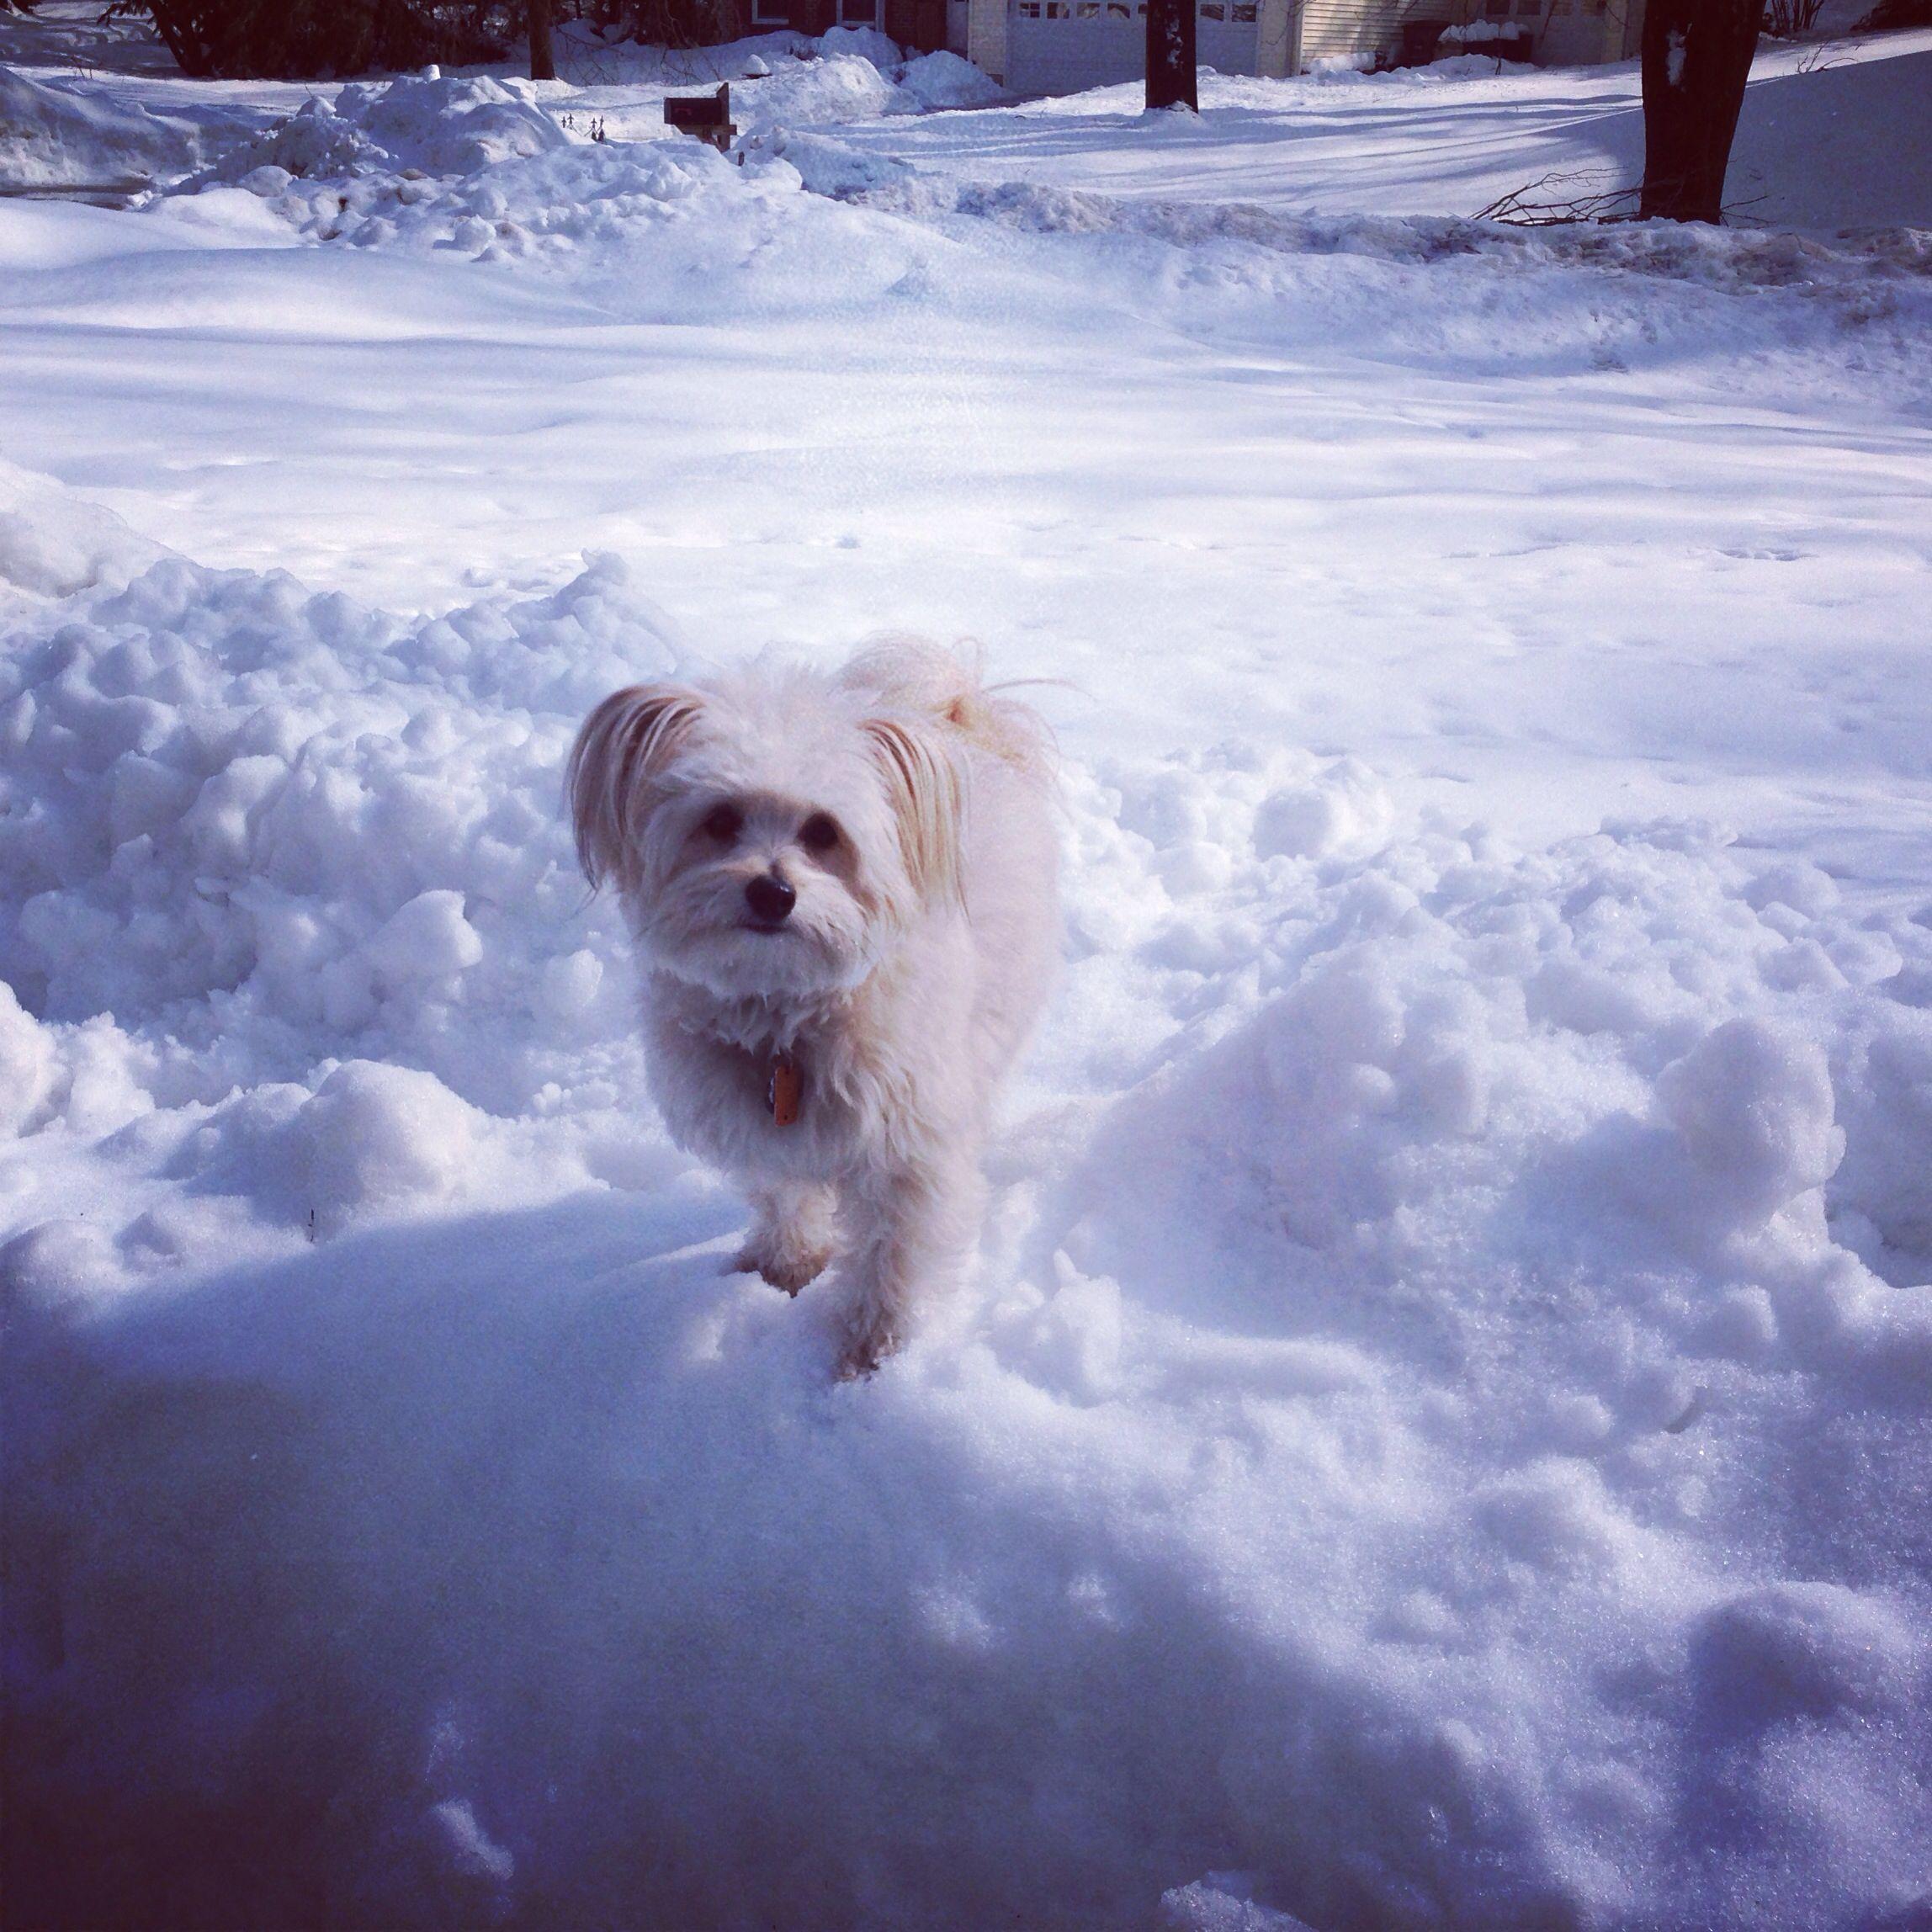 Yorkie poo snow